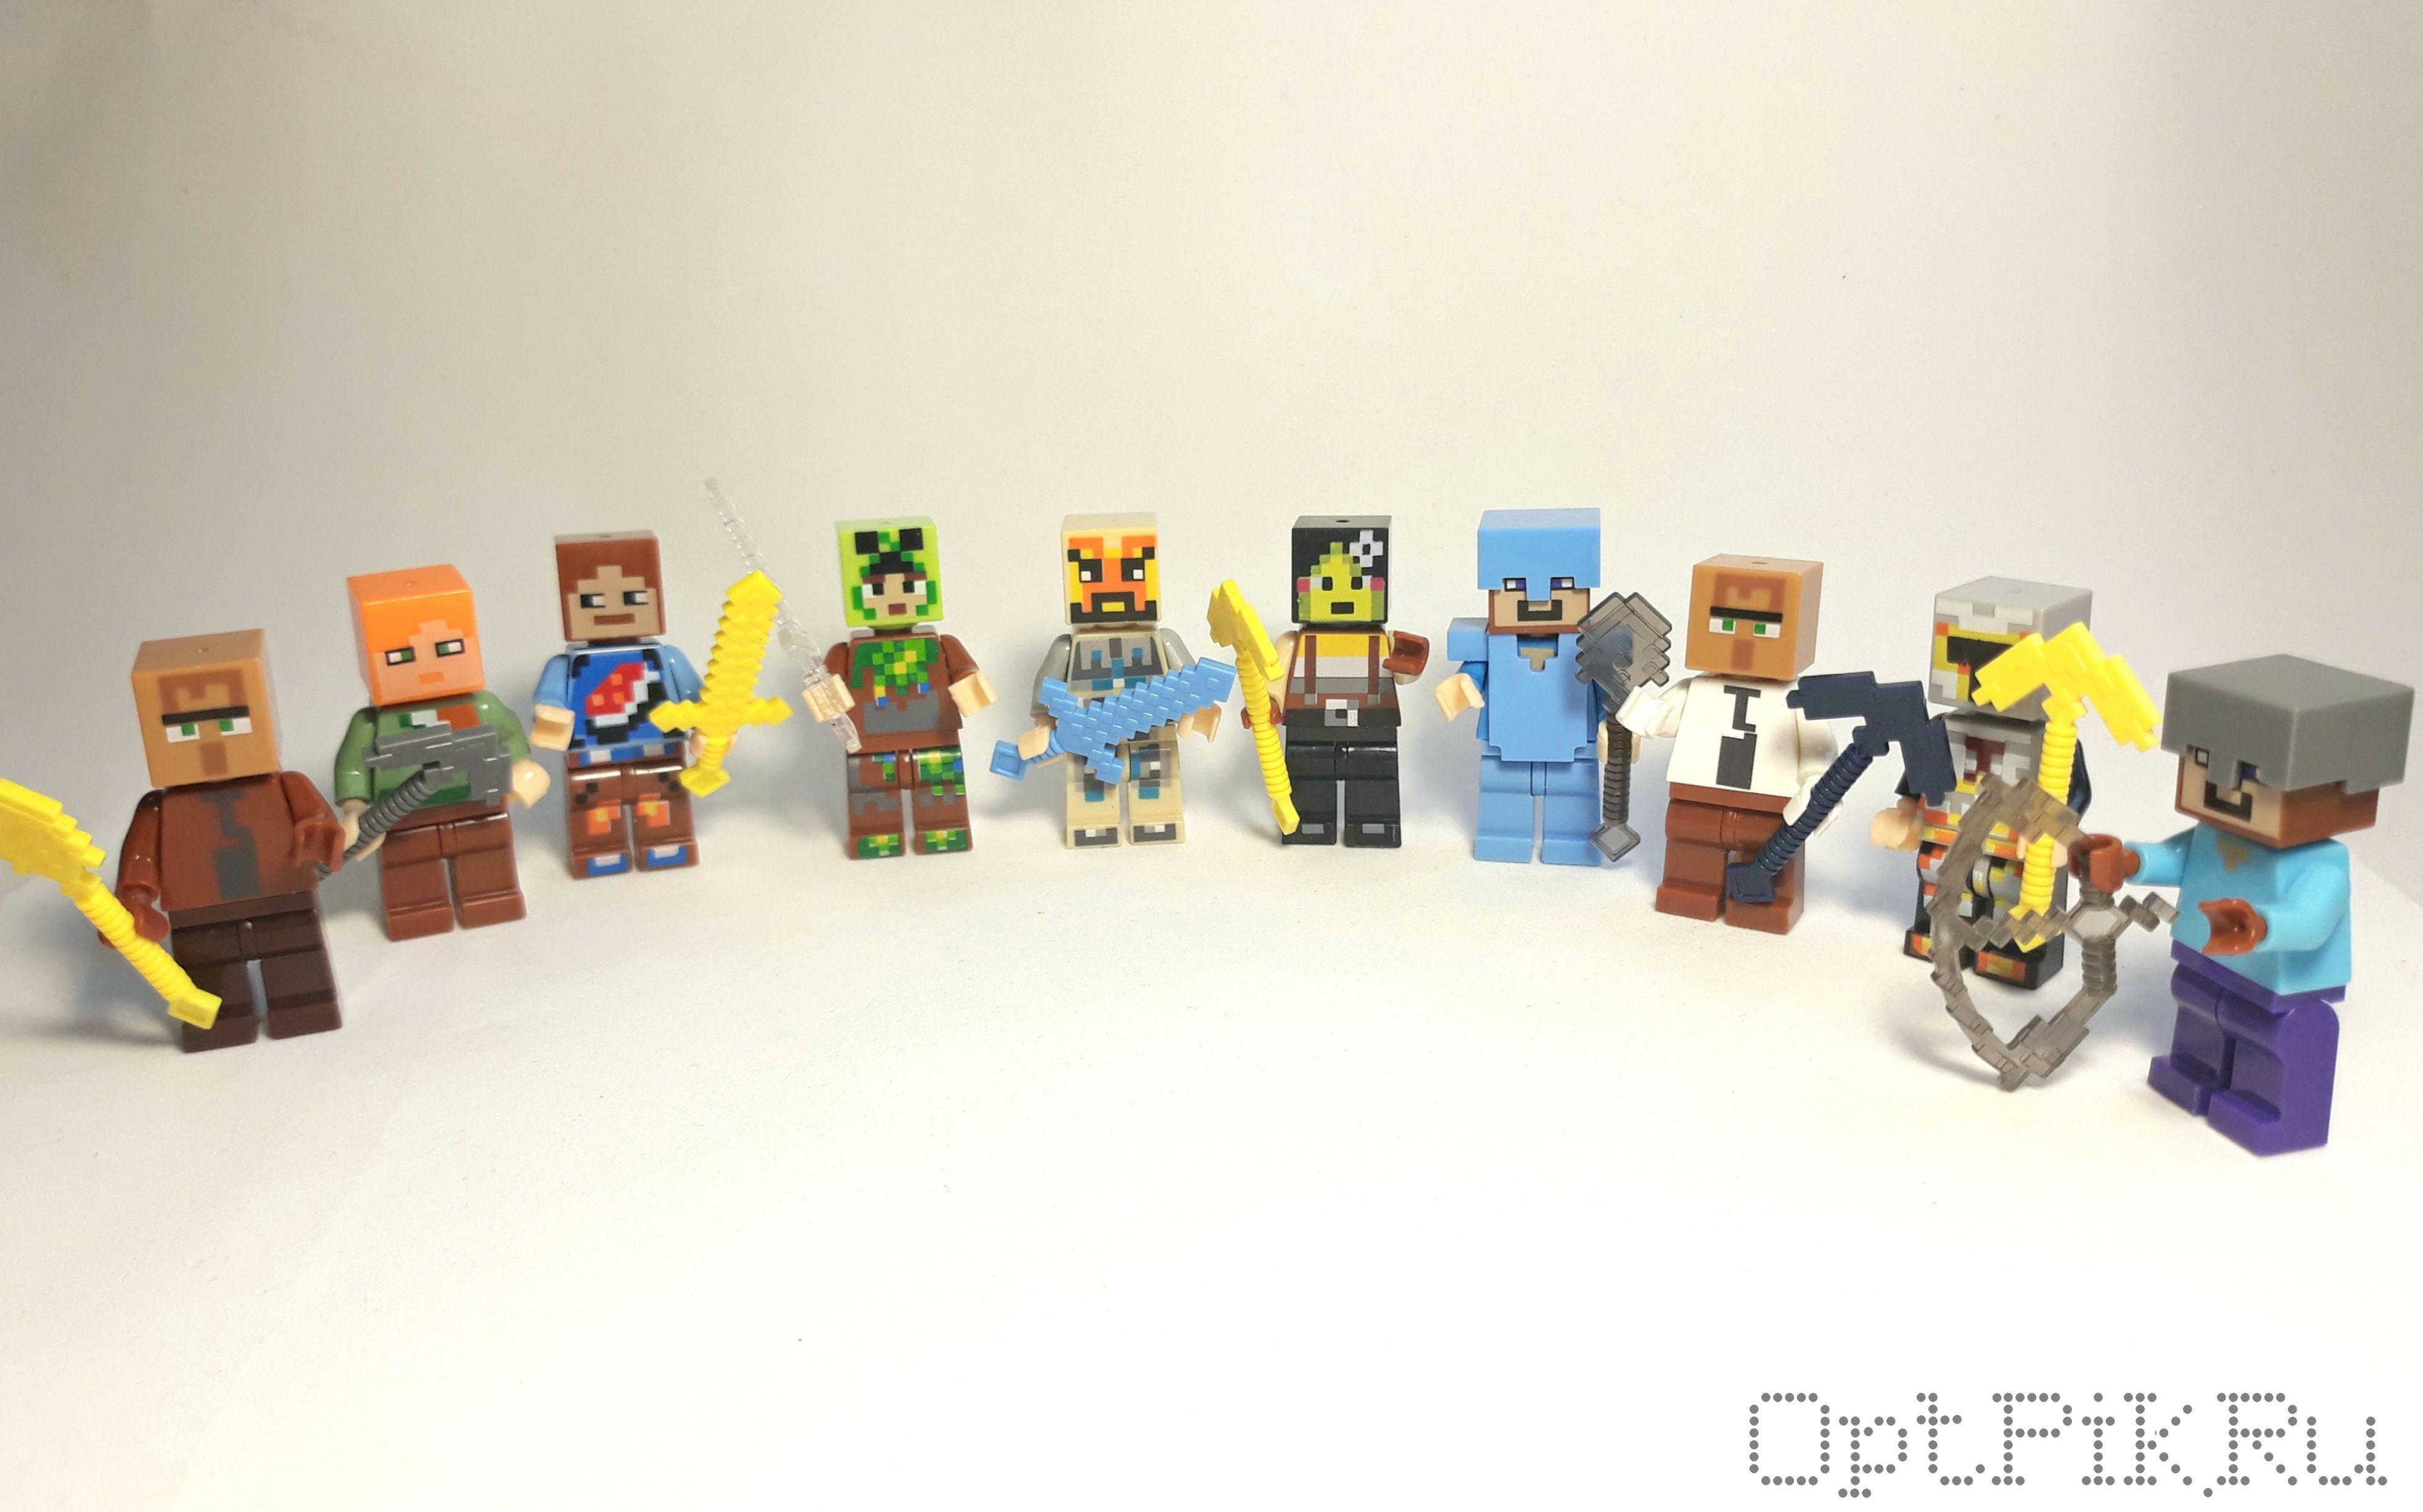 Шарик-сюрприз Персонажи Майнкрафт Minecraft